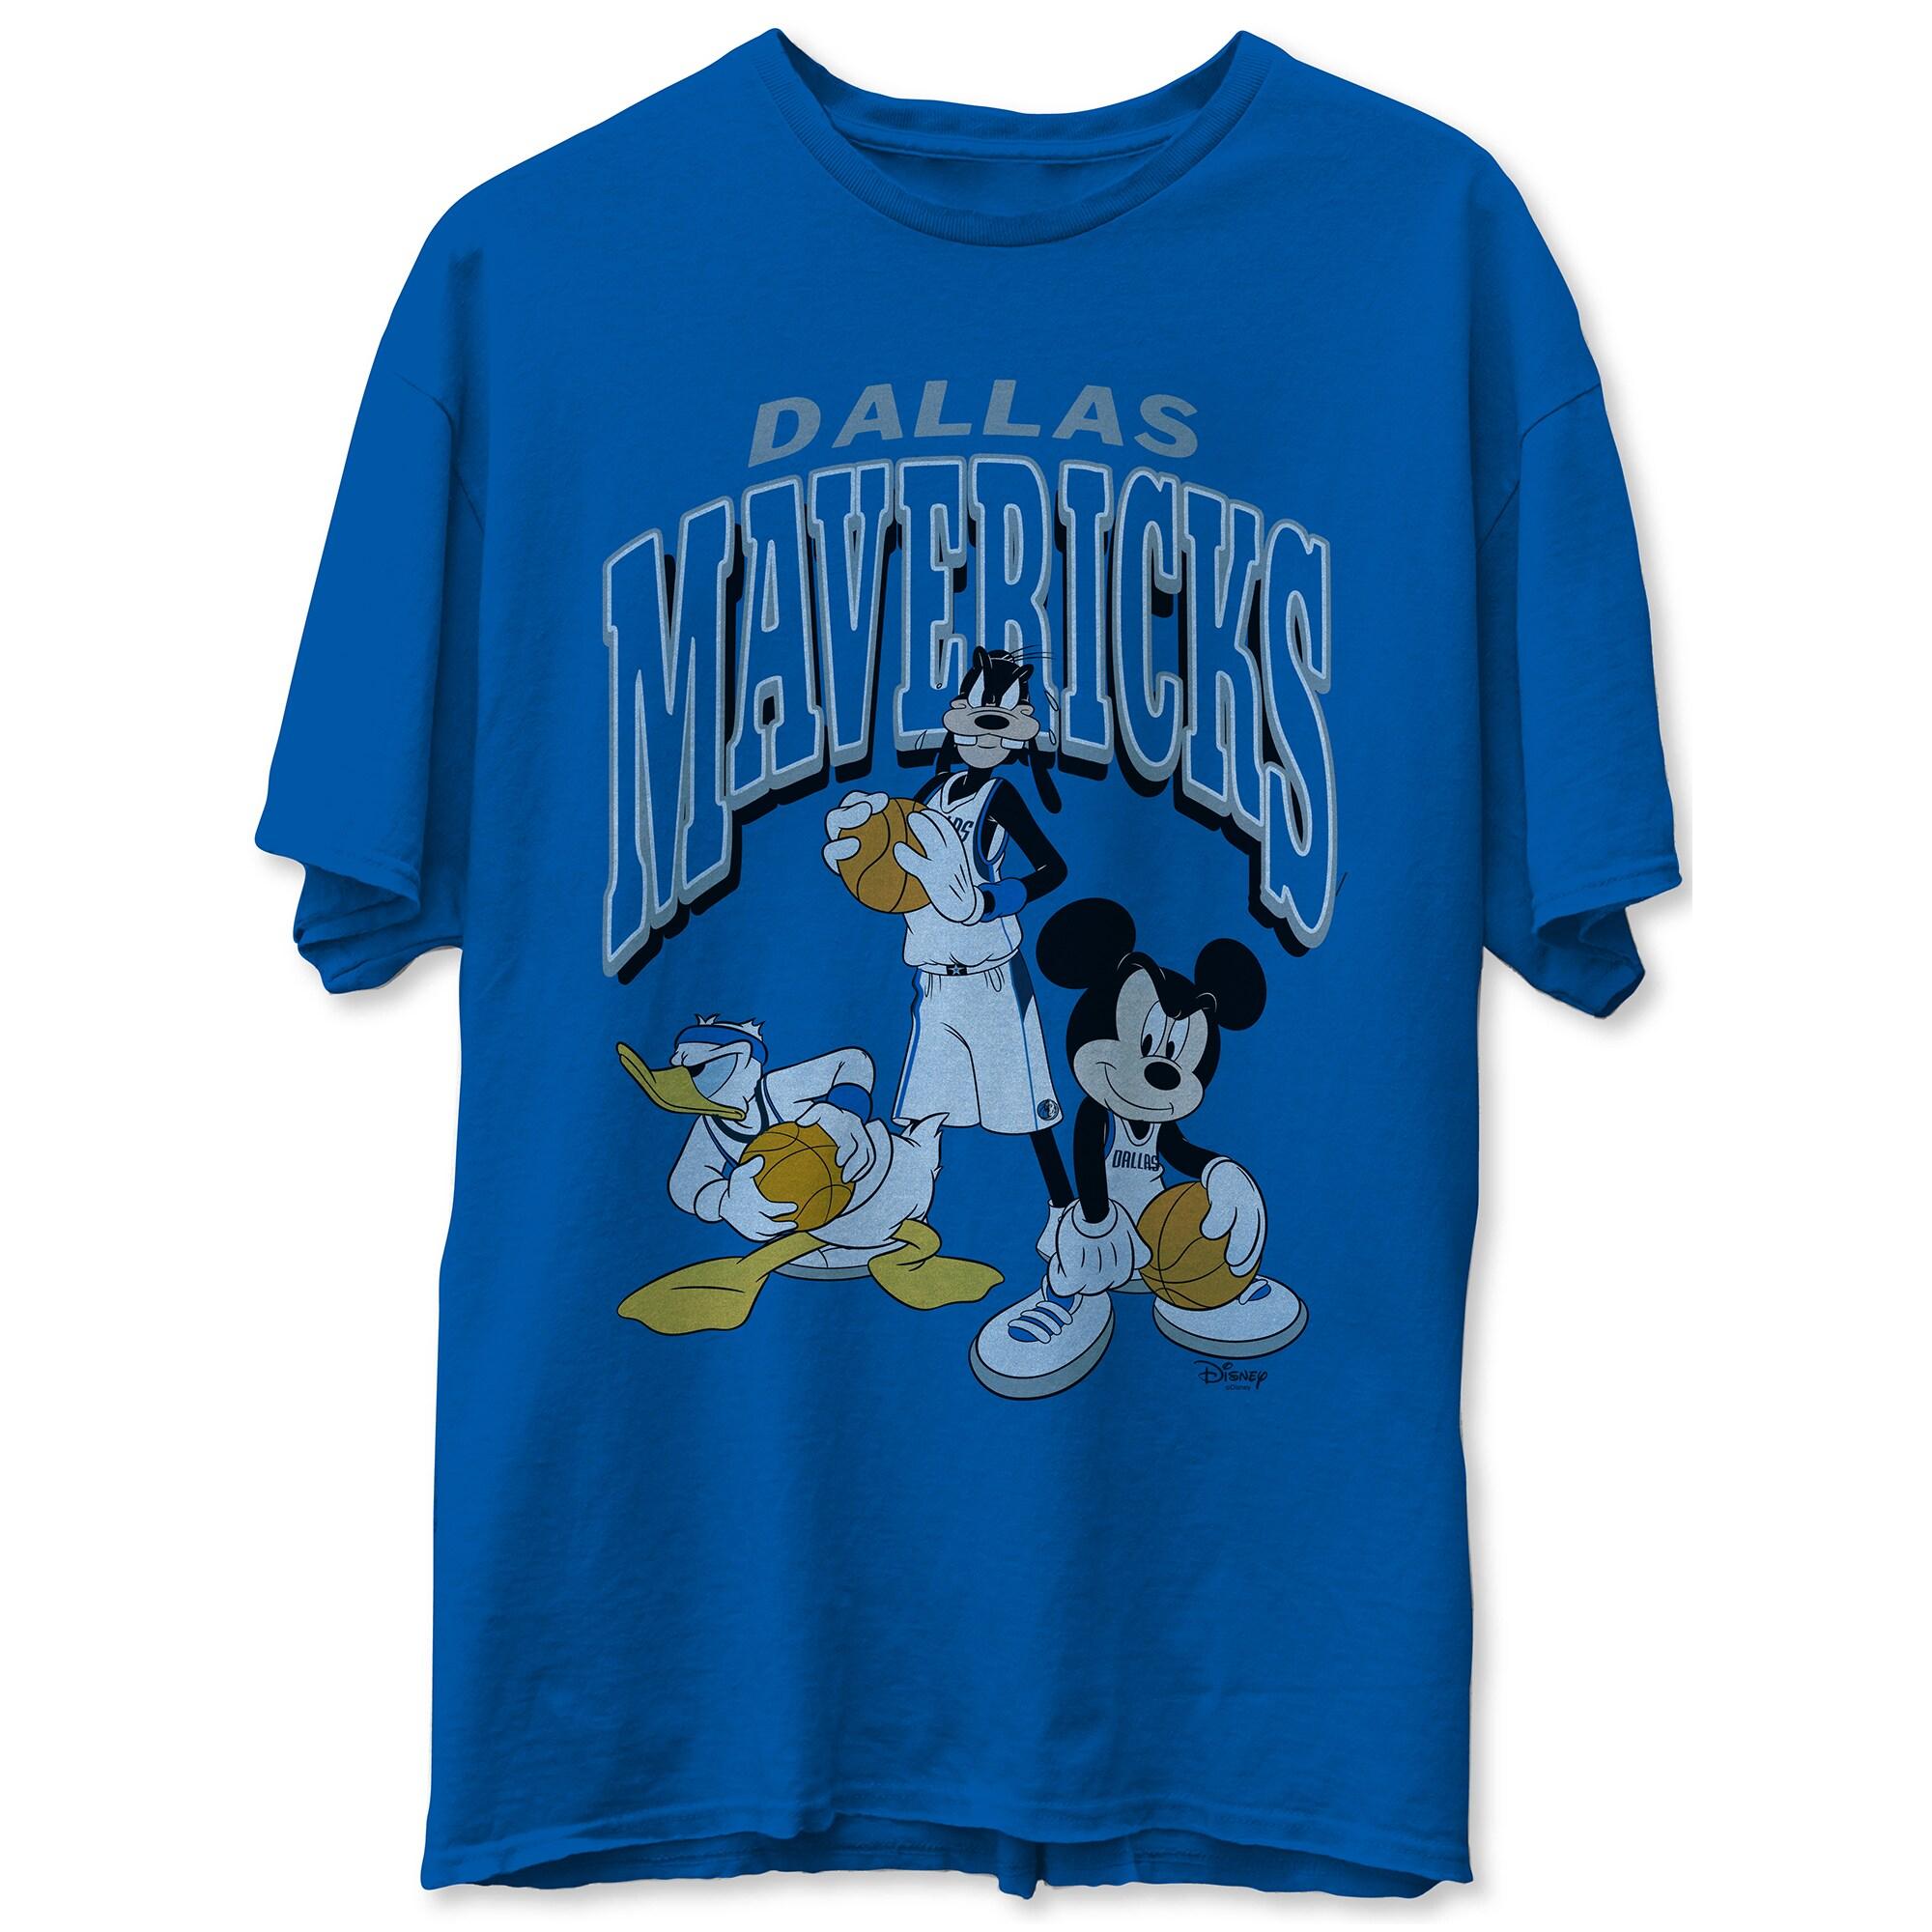 Dallas Mavericks Junk Food Disney Mickey Squad T-Shirt - Royal